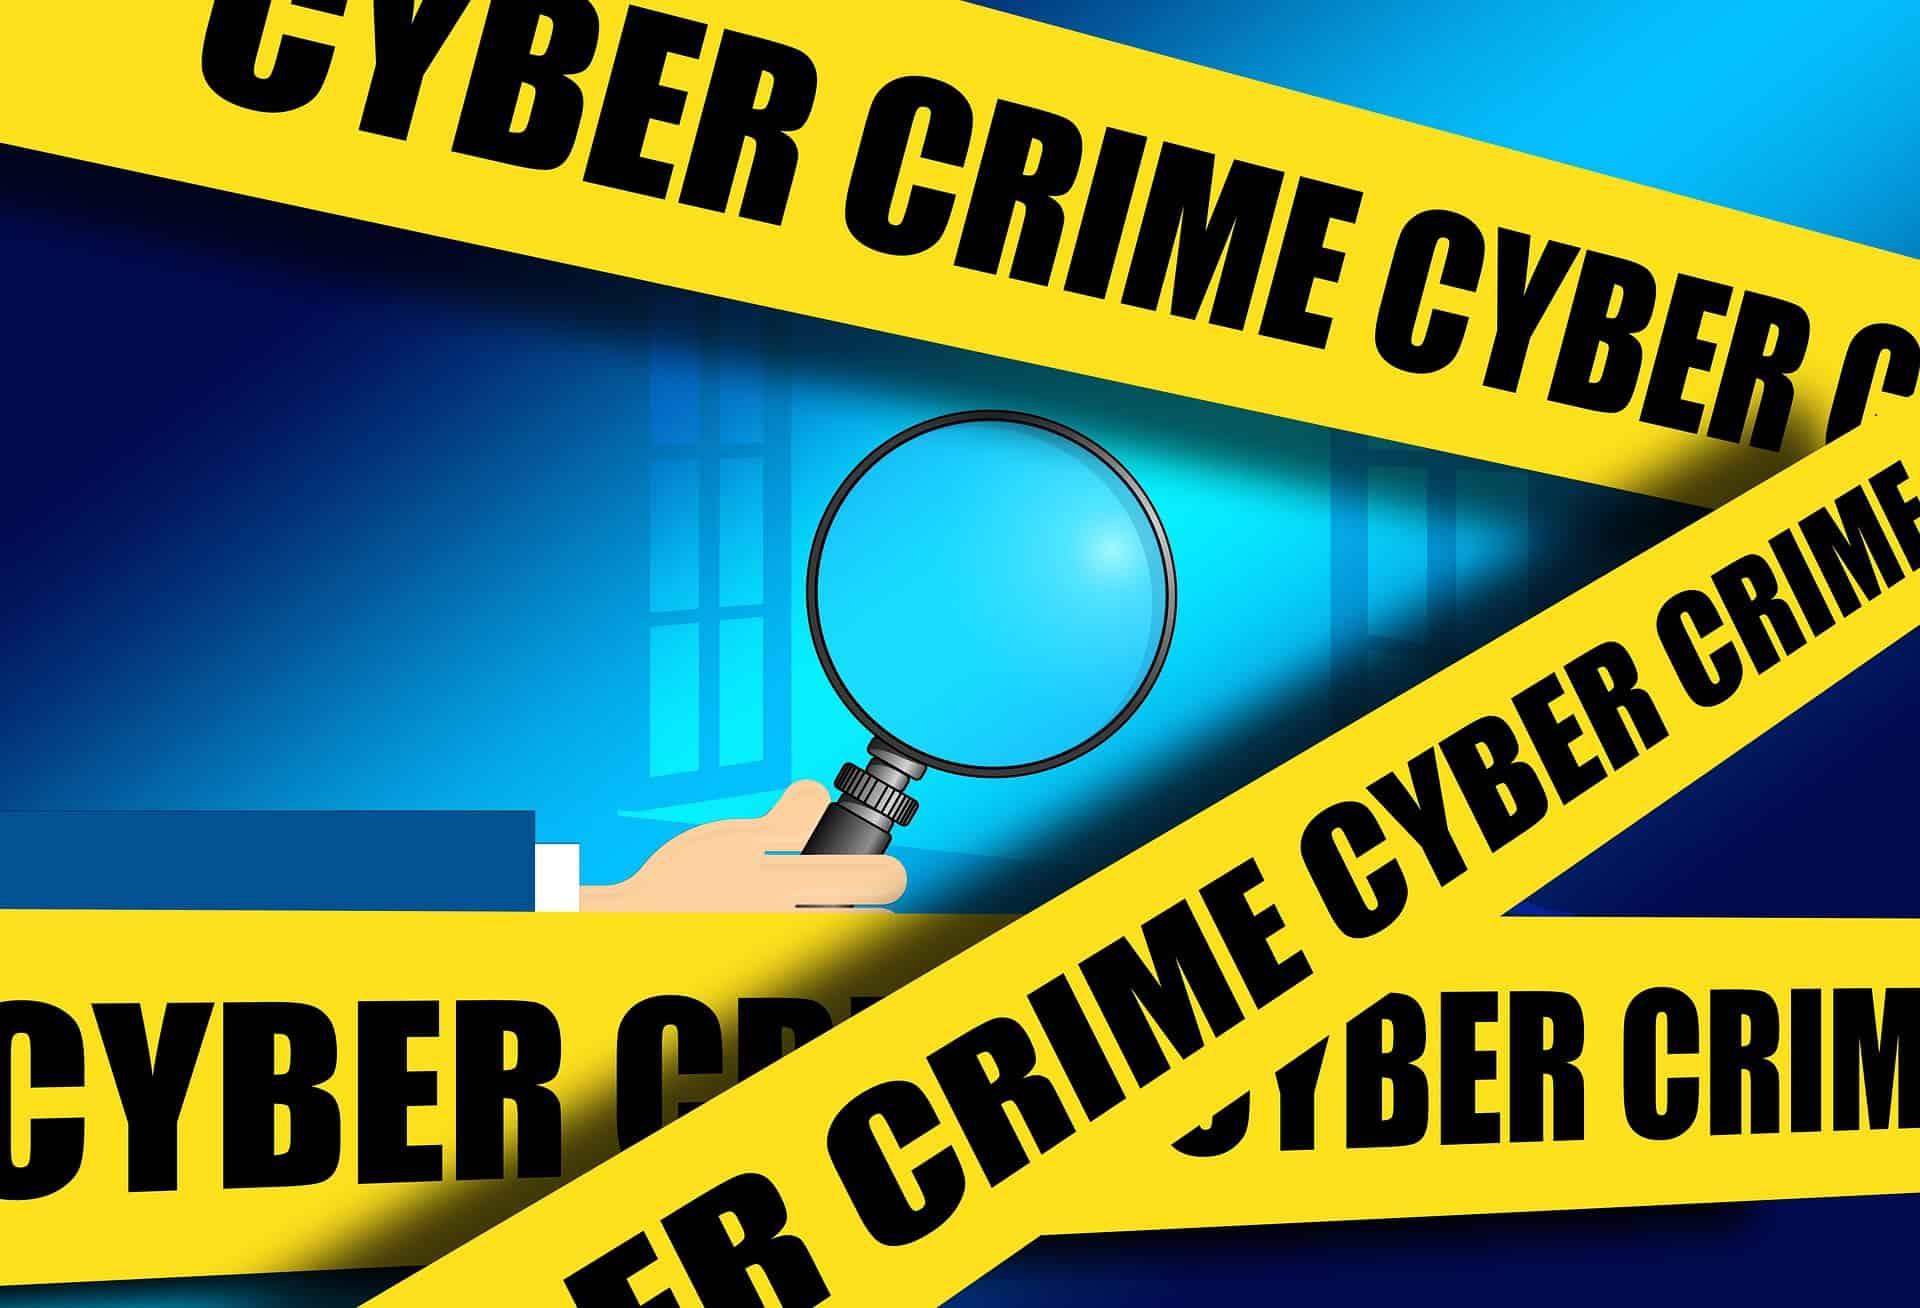 Cybercriminals Have Seven-Day Advantage to Weaponize Vulnerabilities